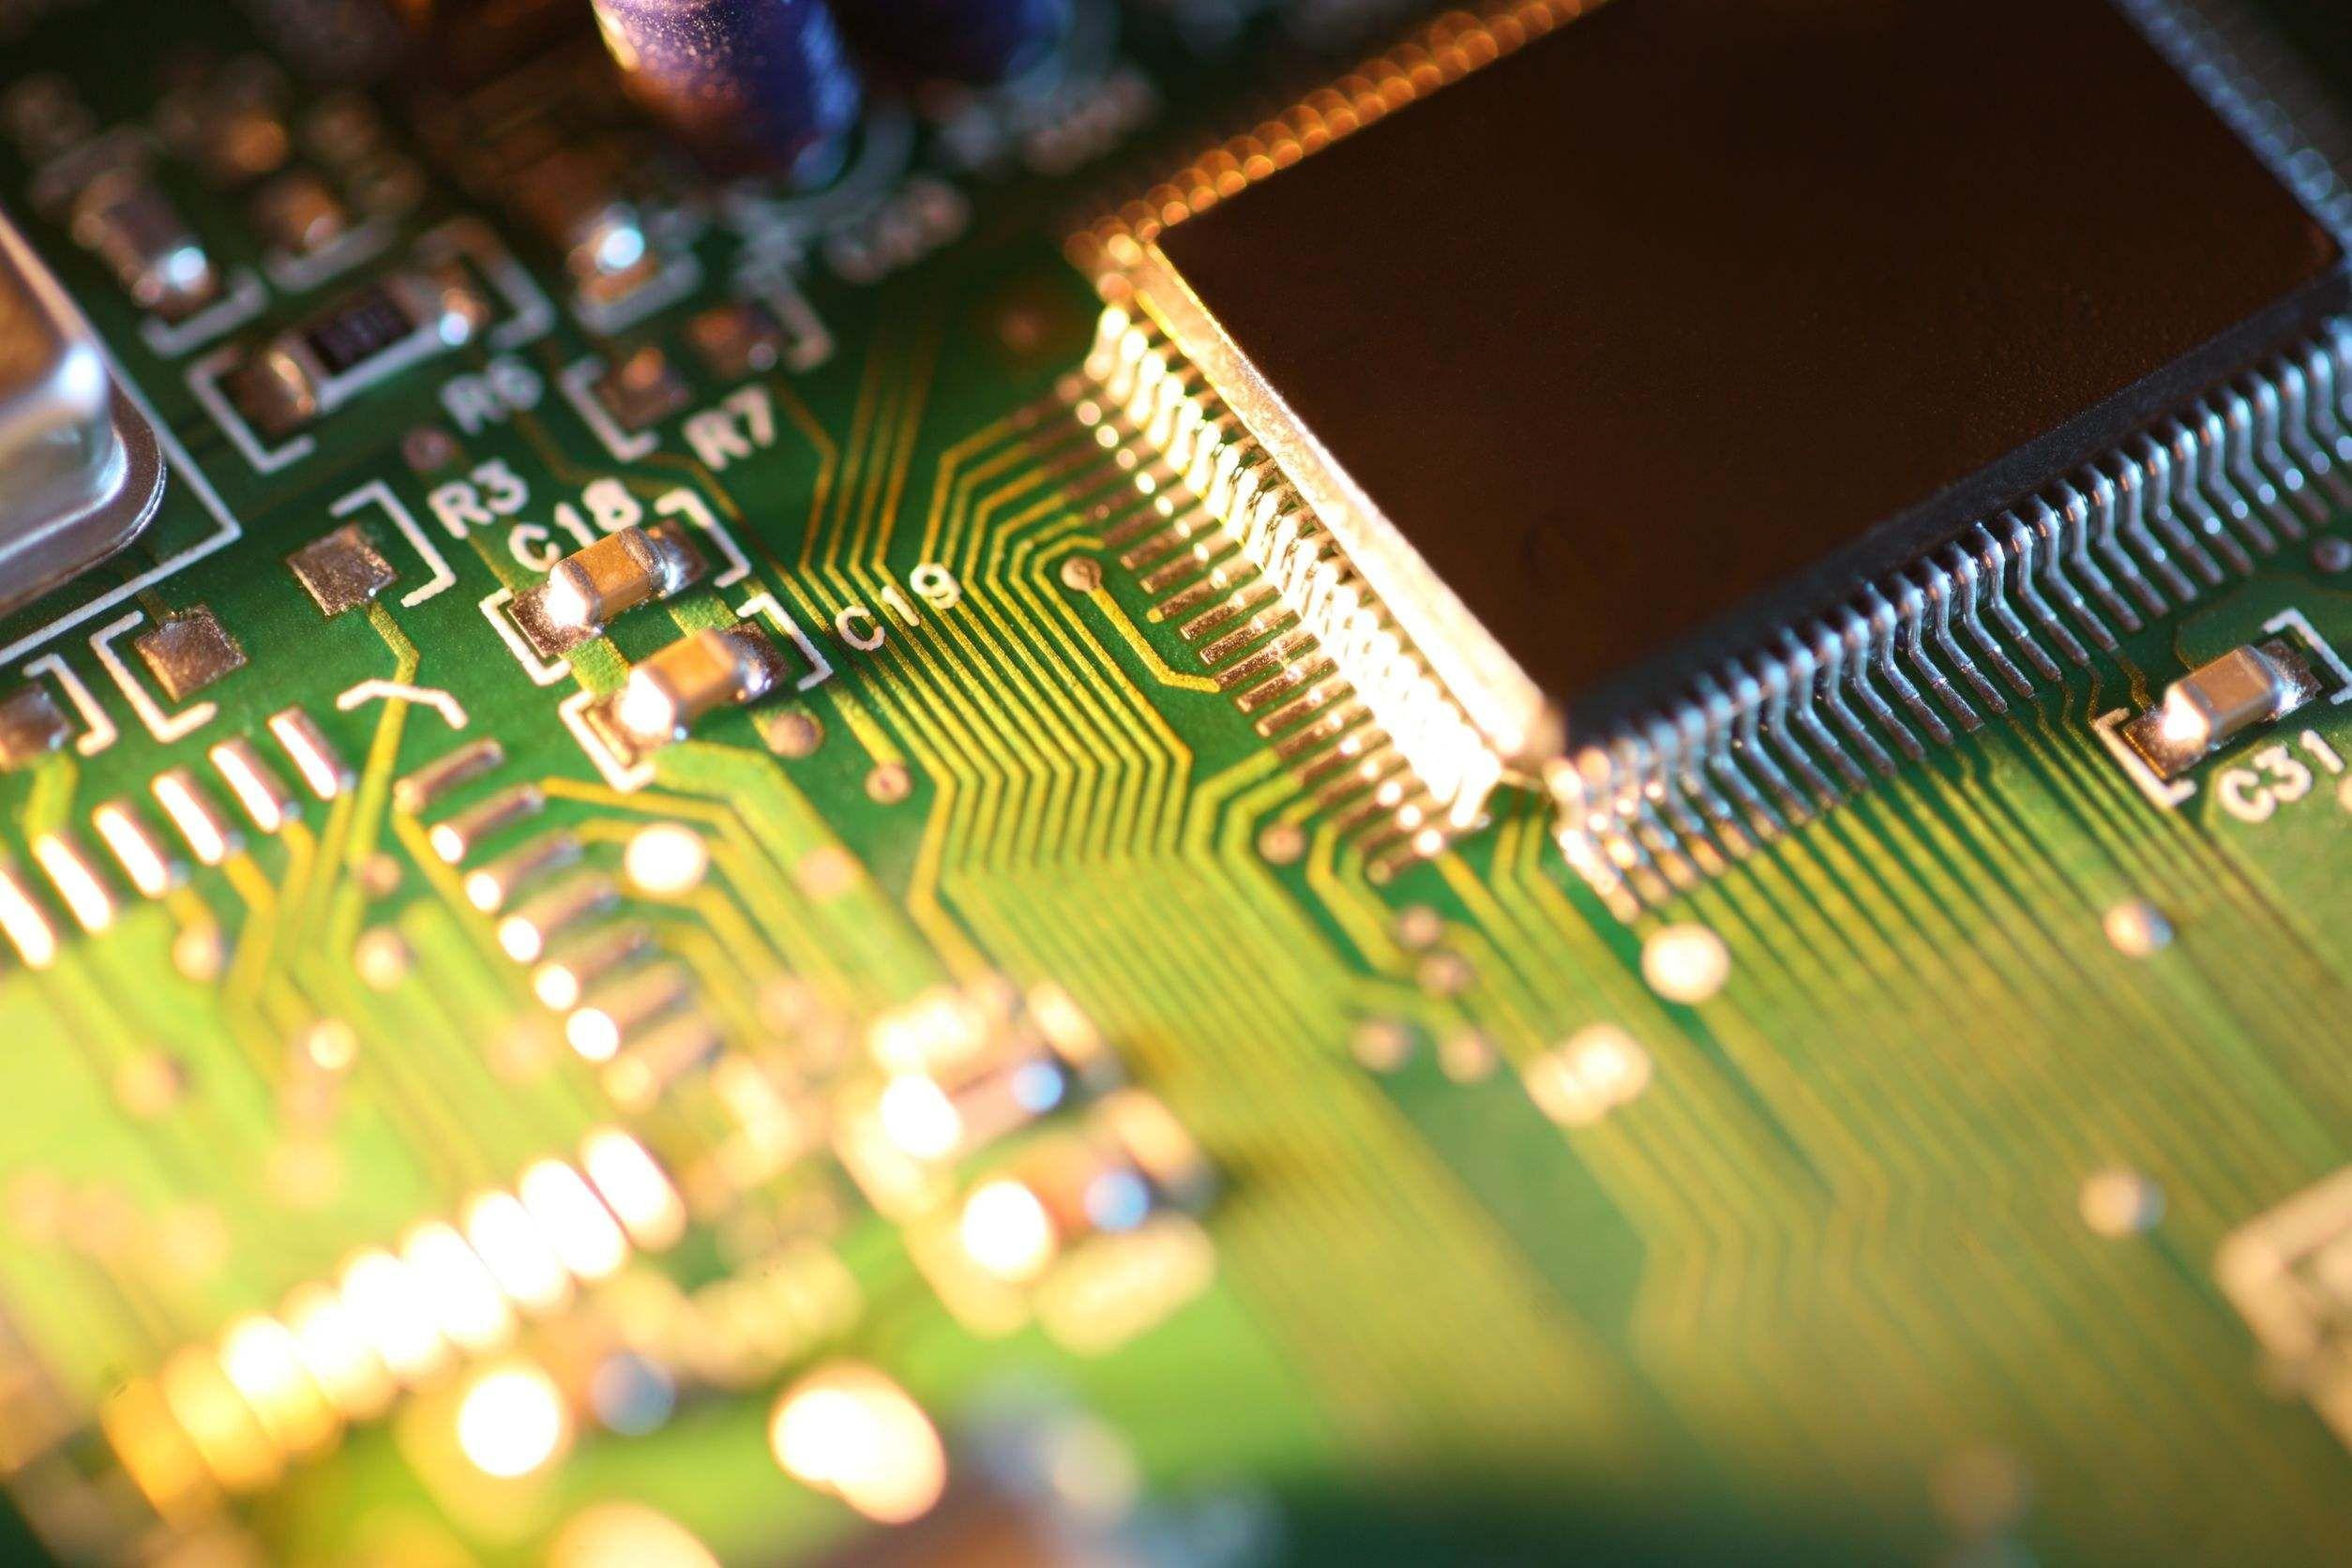 Superior Electronic Design Services Proteus Invents Pcb Board Circuit Process